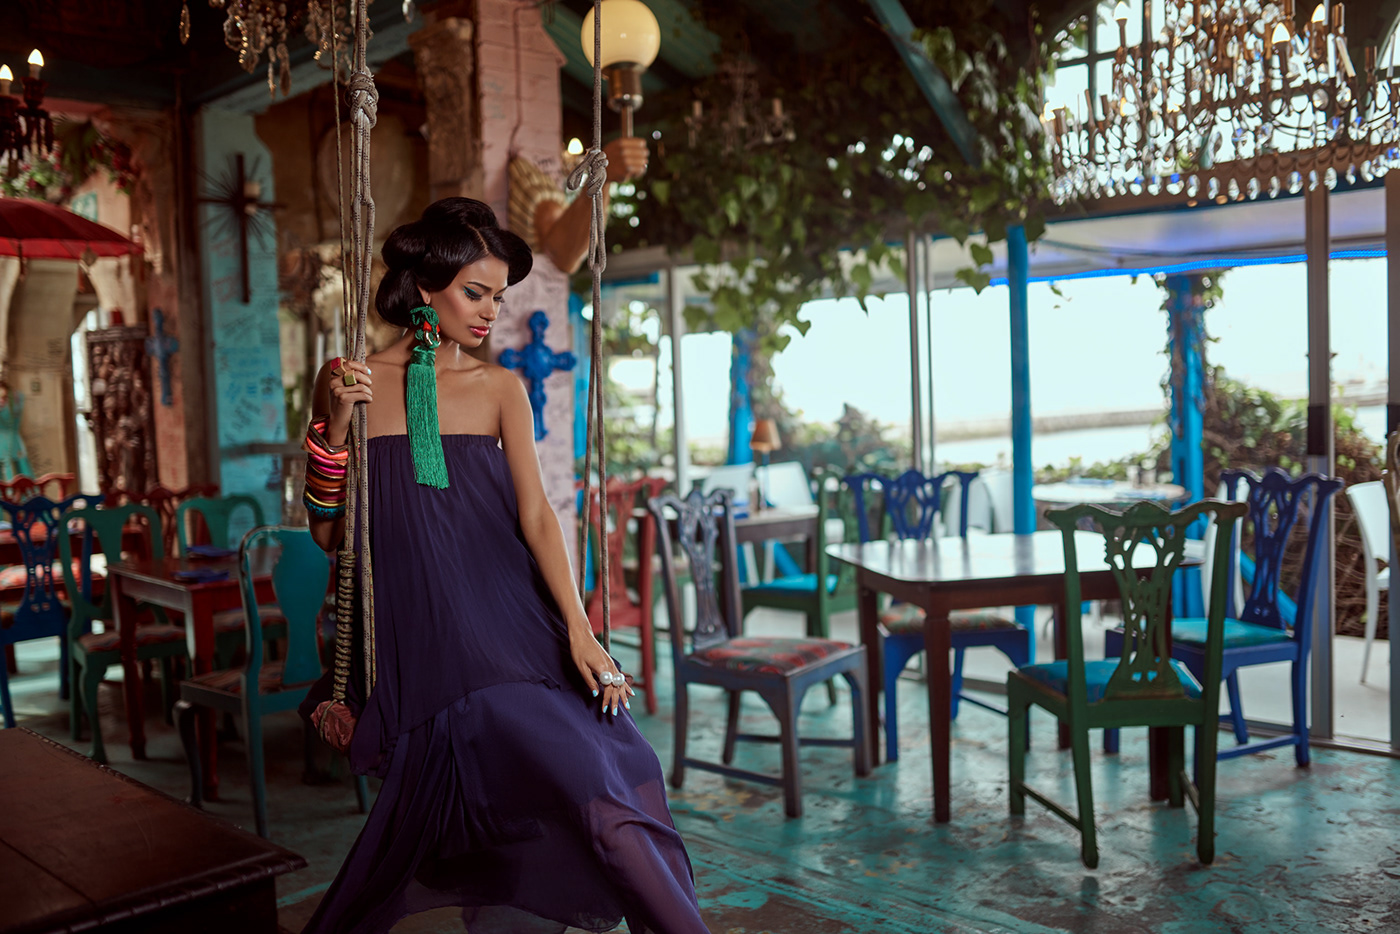 Cape To Cube - A Fashion Story For United Maverick Magazine vl4 / фото Ingrid Alice Irsigler